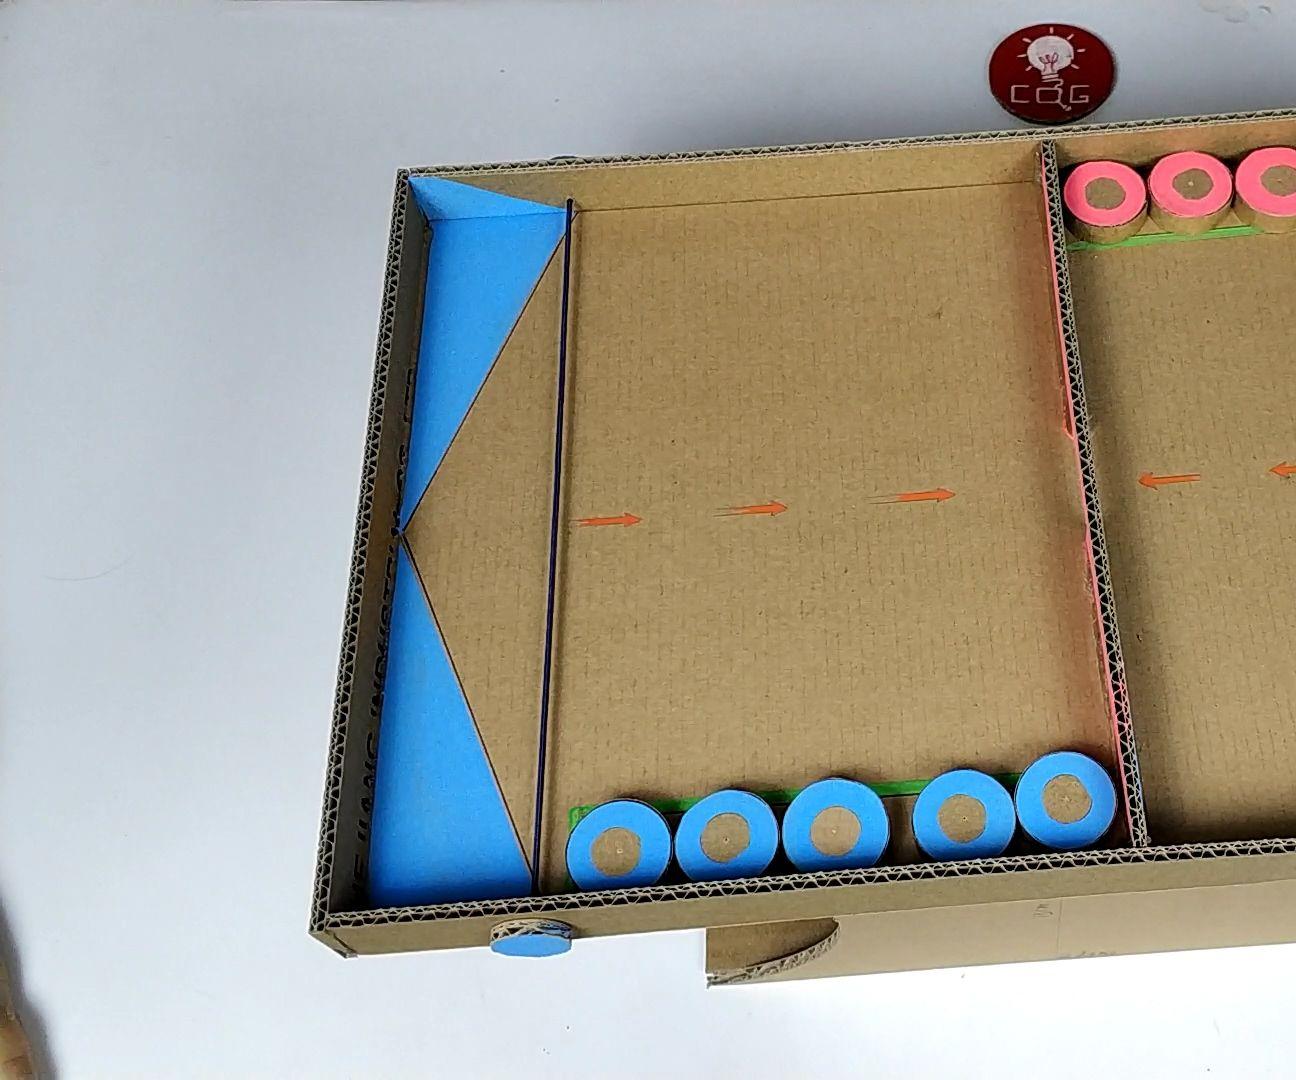 Making Two People Shuffleboard Tabletop Toys in Household Cardboard